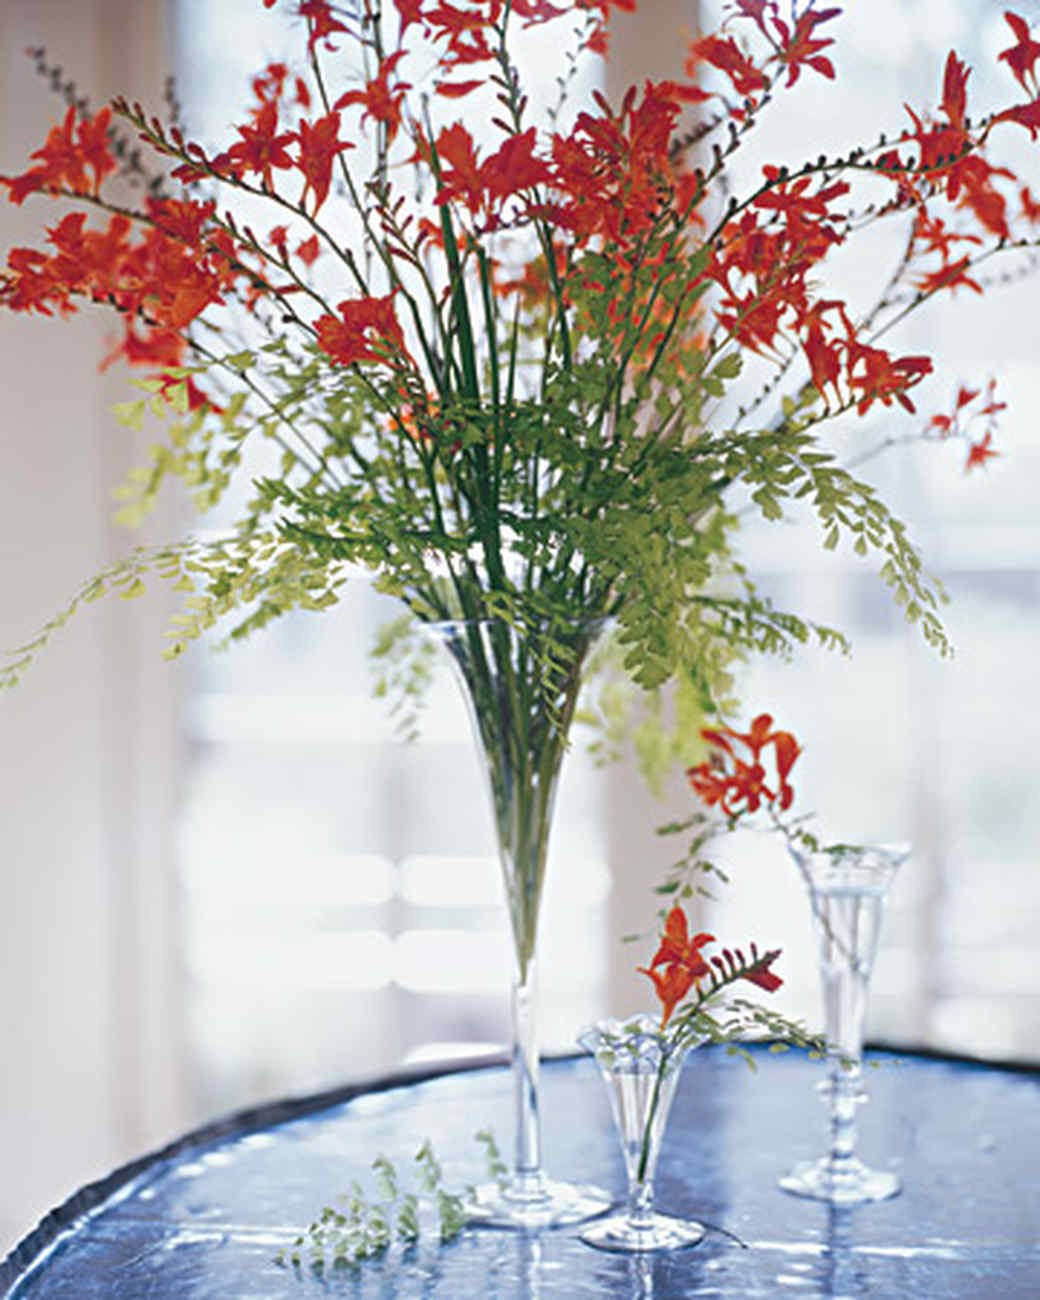 19 Unique Extra Large Vases for Sale 2021 free download extra large vases for sale of marthas flower arranging secrets martha stewart inside lesson 3